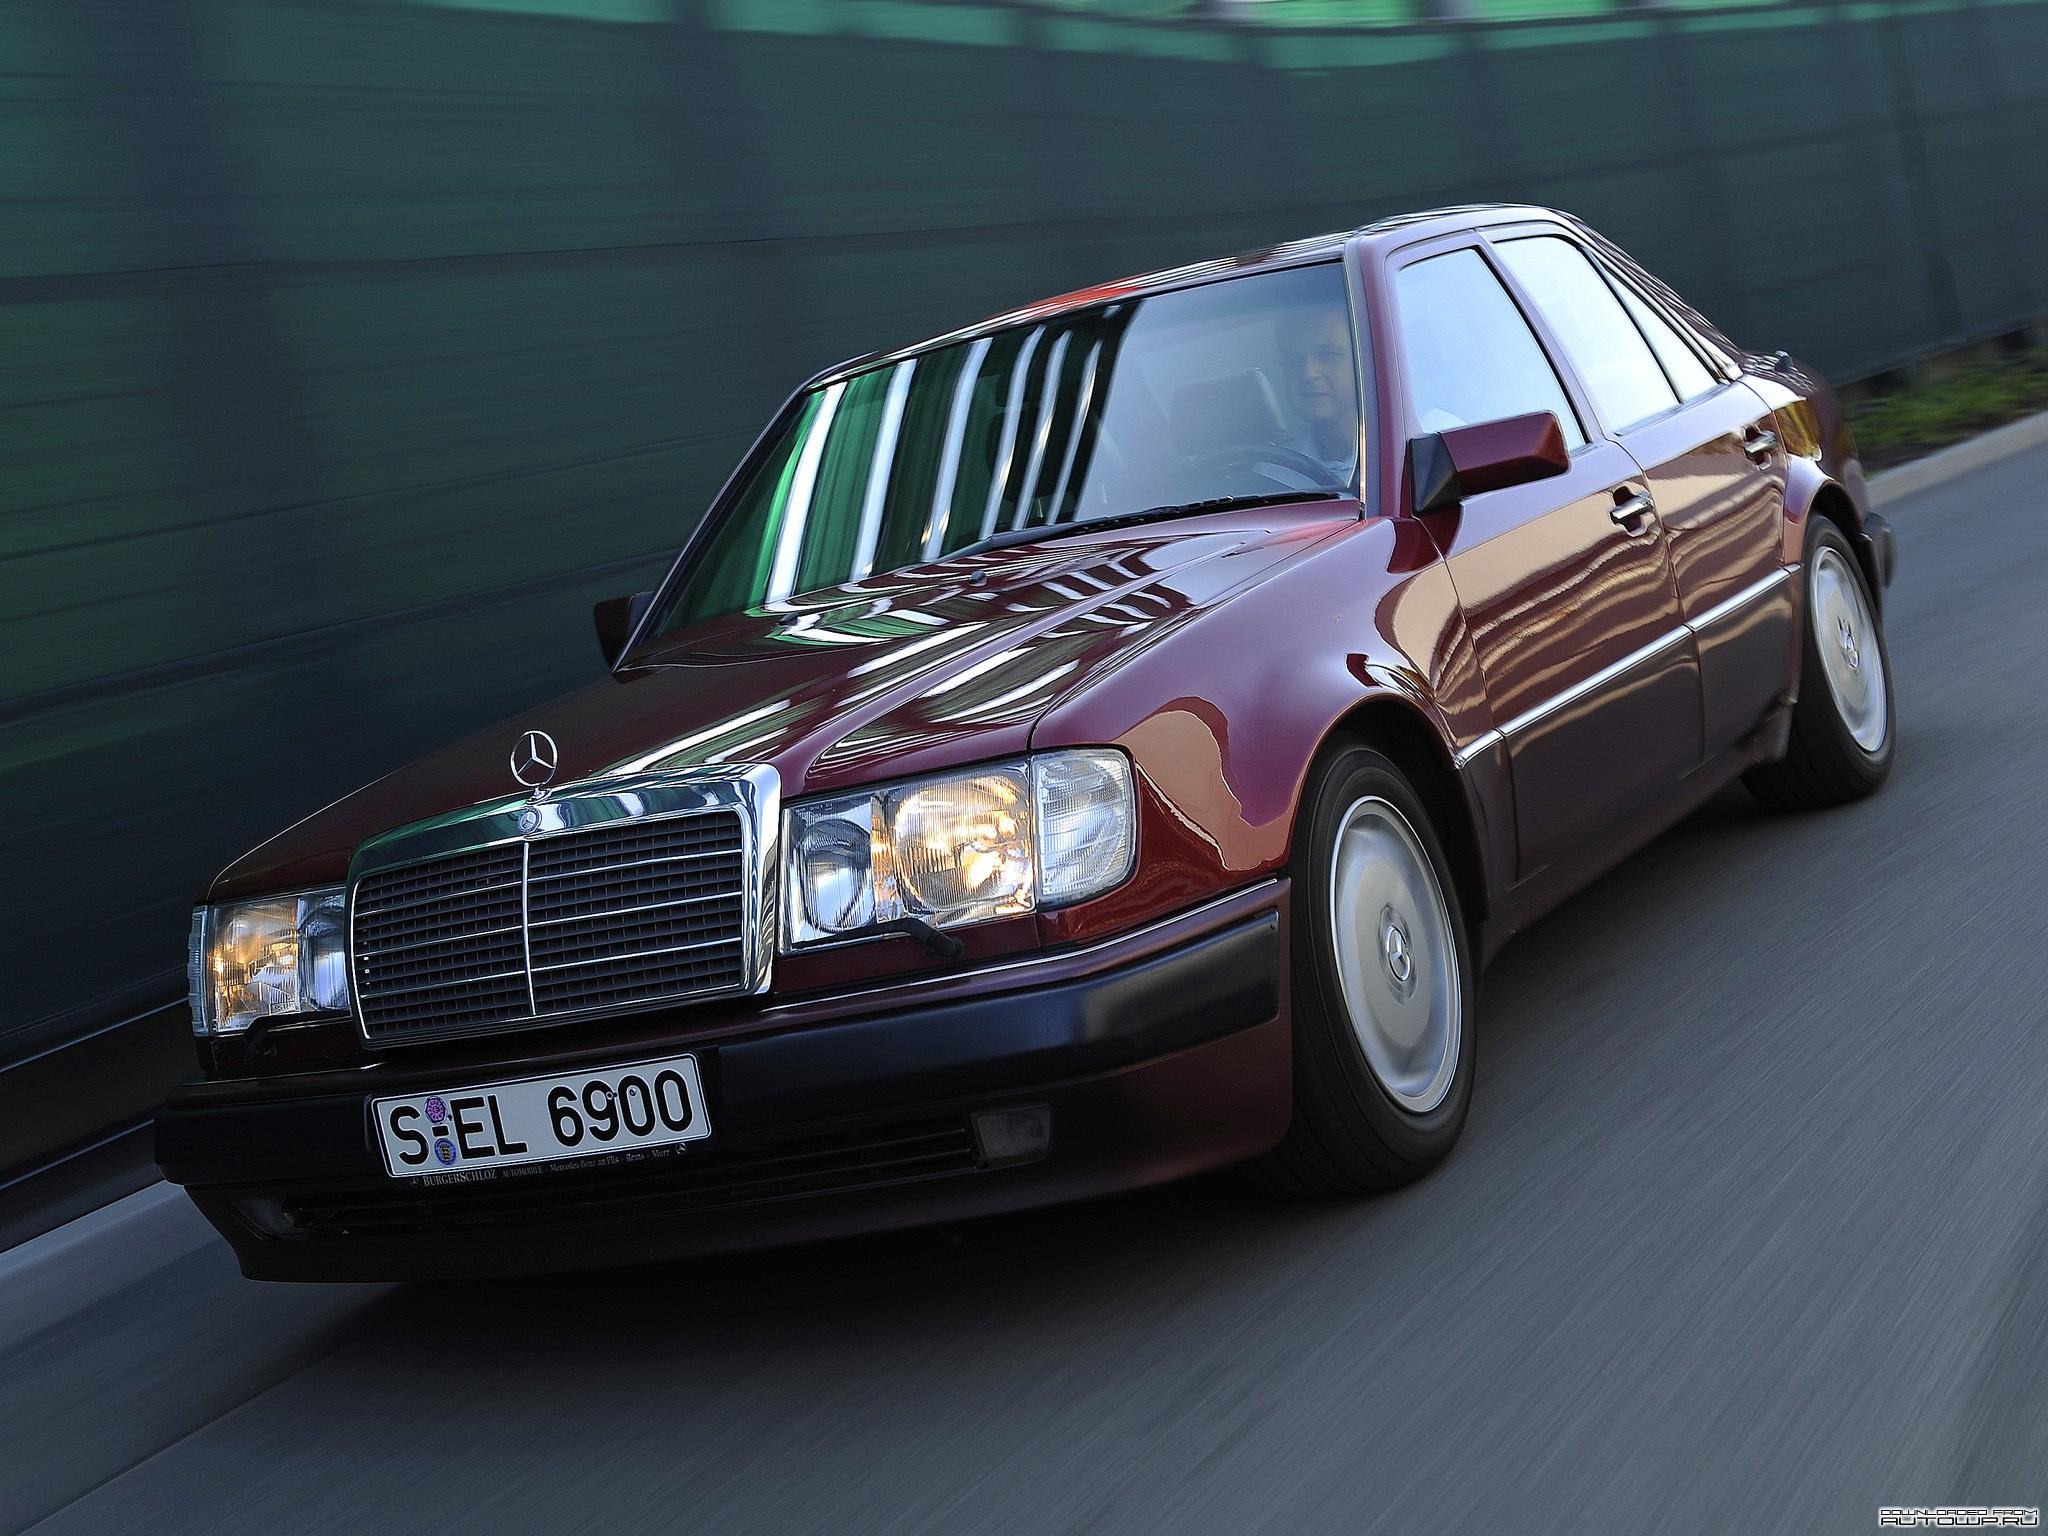 ec3c0853e55 Mercedes-Benz E-Class W124 photos - PhotoGallery with 25 pics ...